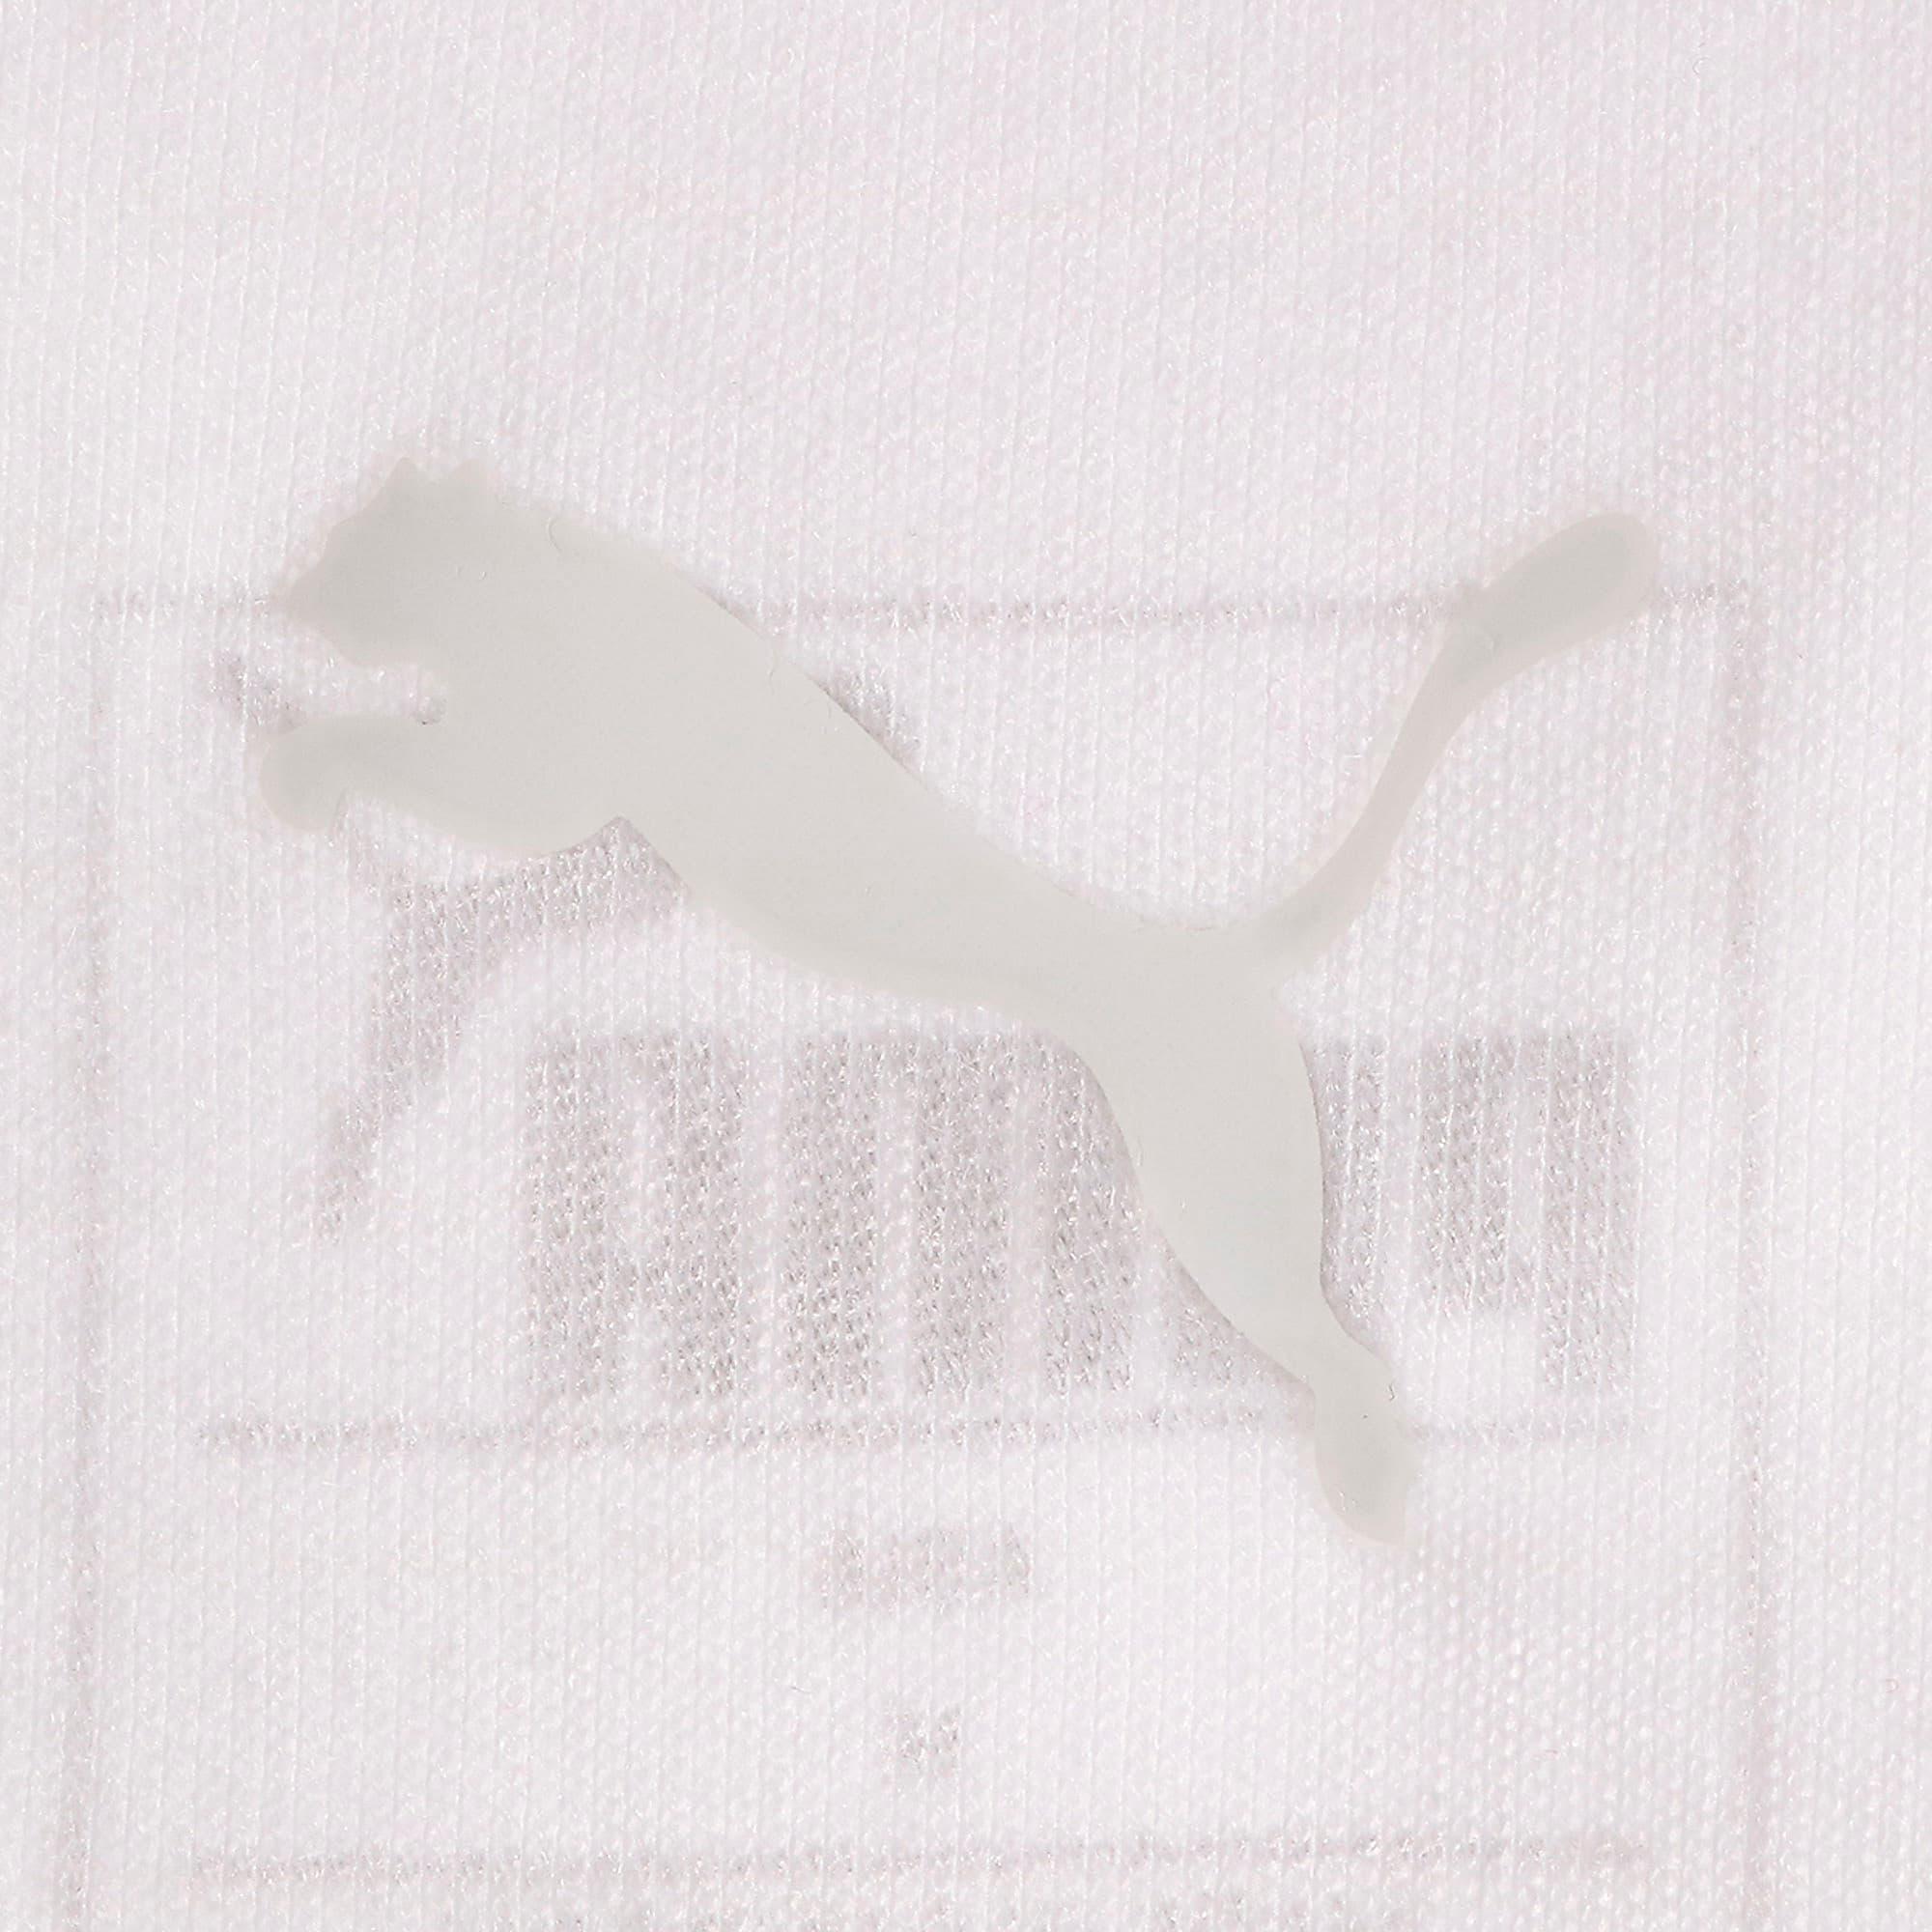 Thumbnail 7 of オウンイット ウィメンズ タンク, Puma White-PUMA wording, medium-JPN